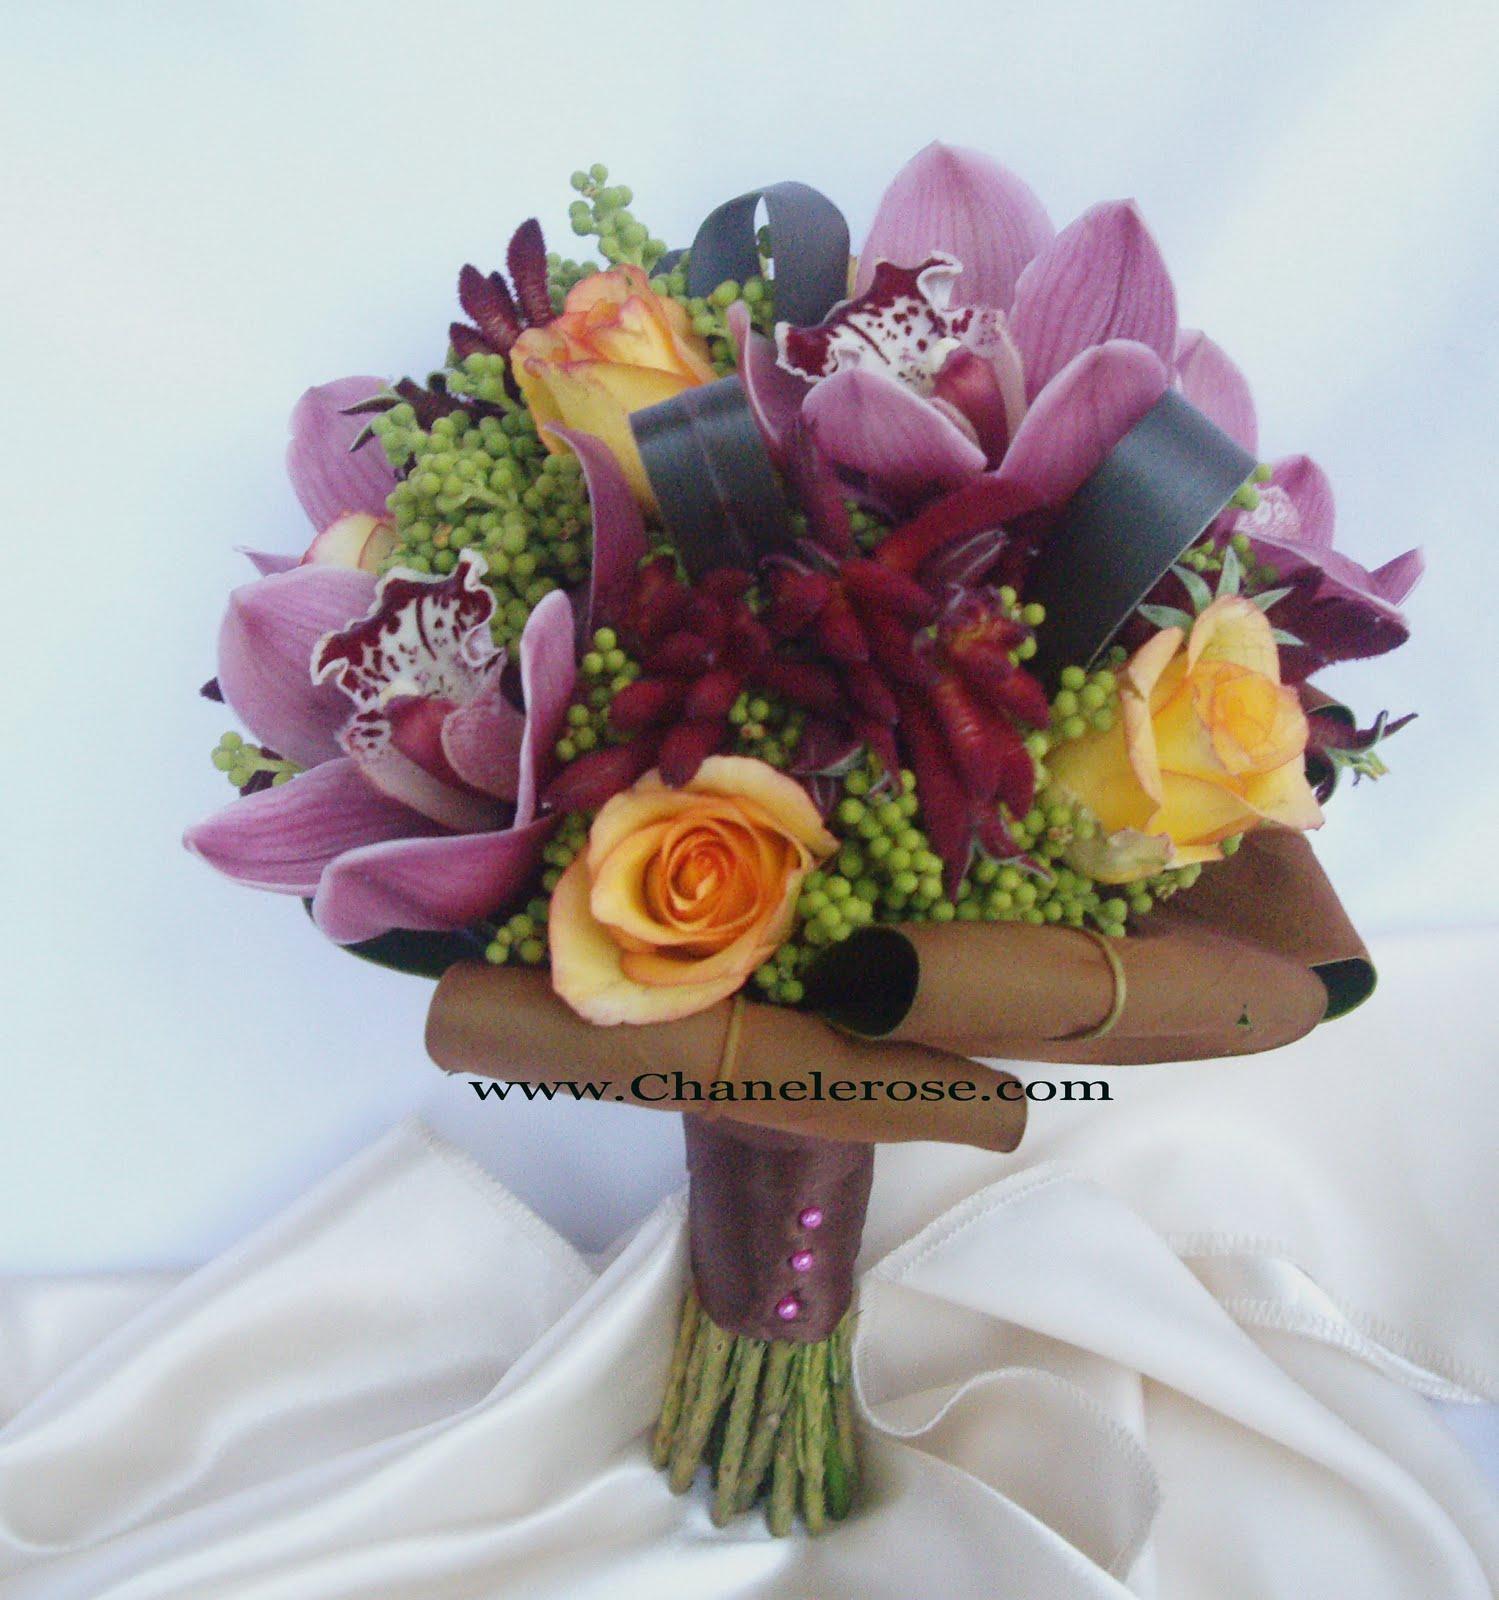 Chanele Rose Flowers Blog Sydney Wedding Stylist Florist